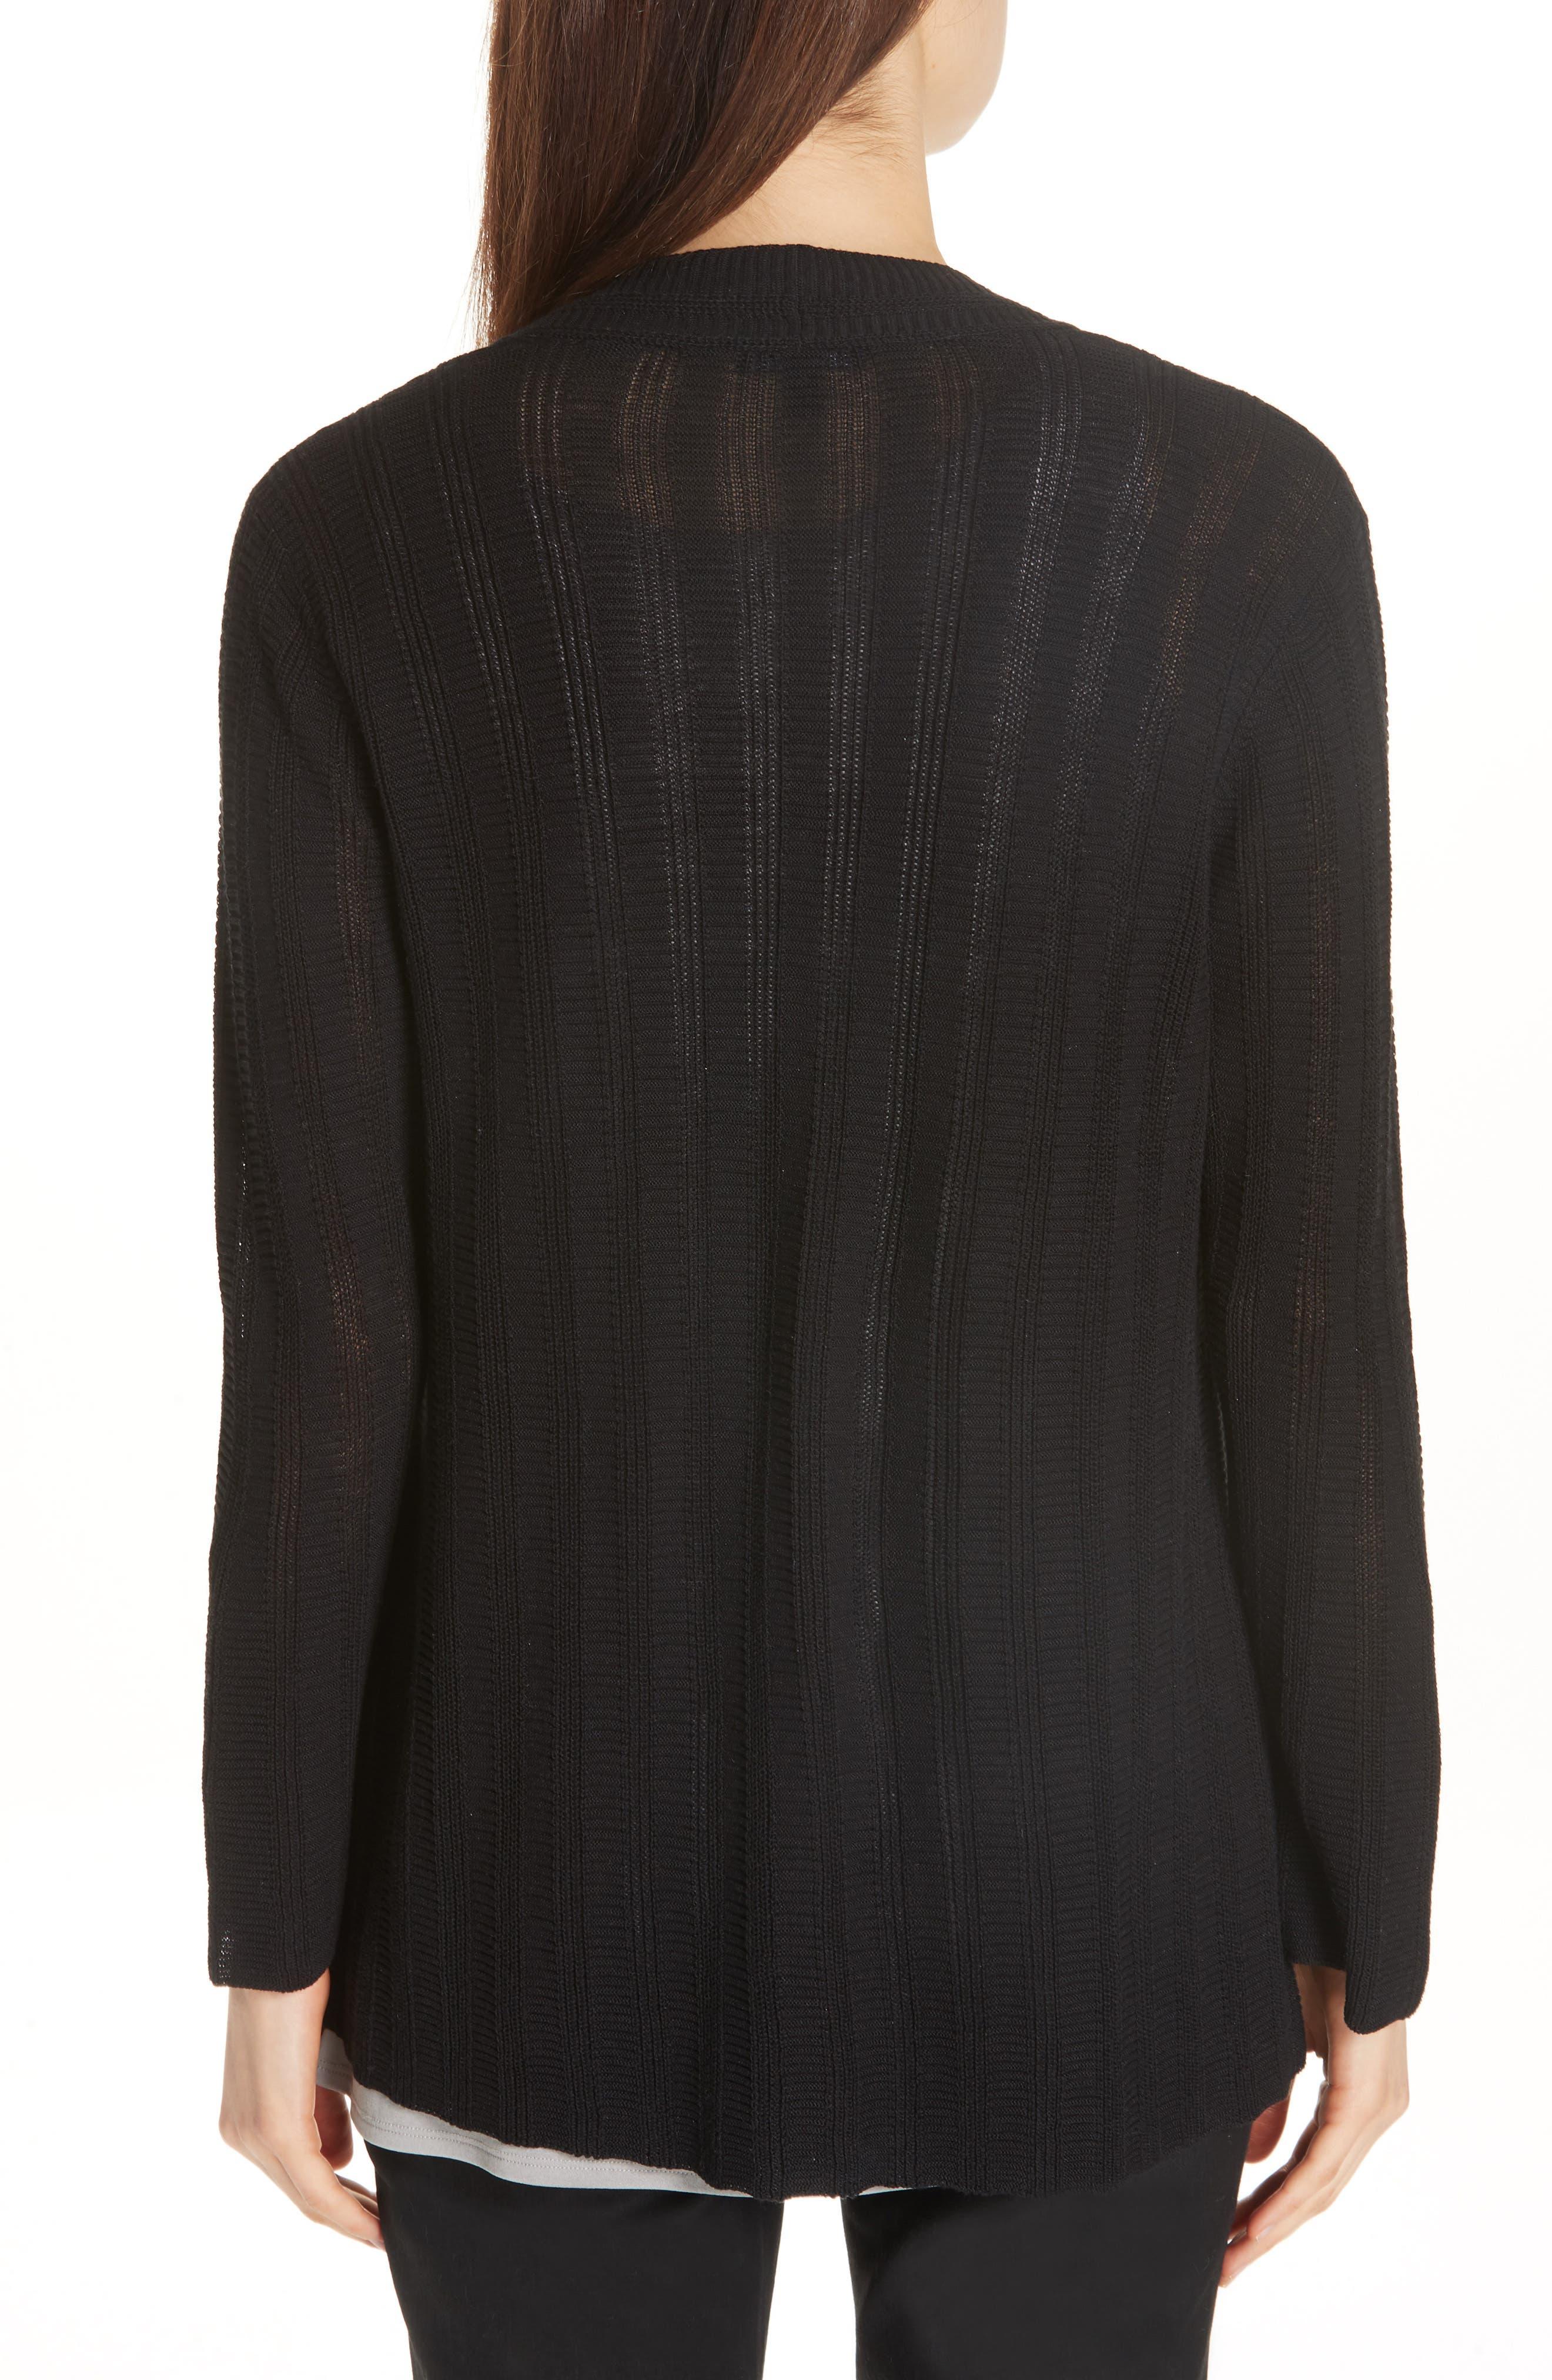 Bell Cuff Silk Blend Cardigan,                             Alternate thumbnail 2, color,                             Black